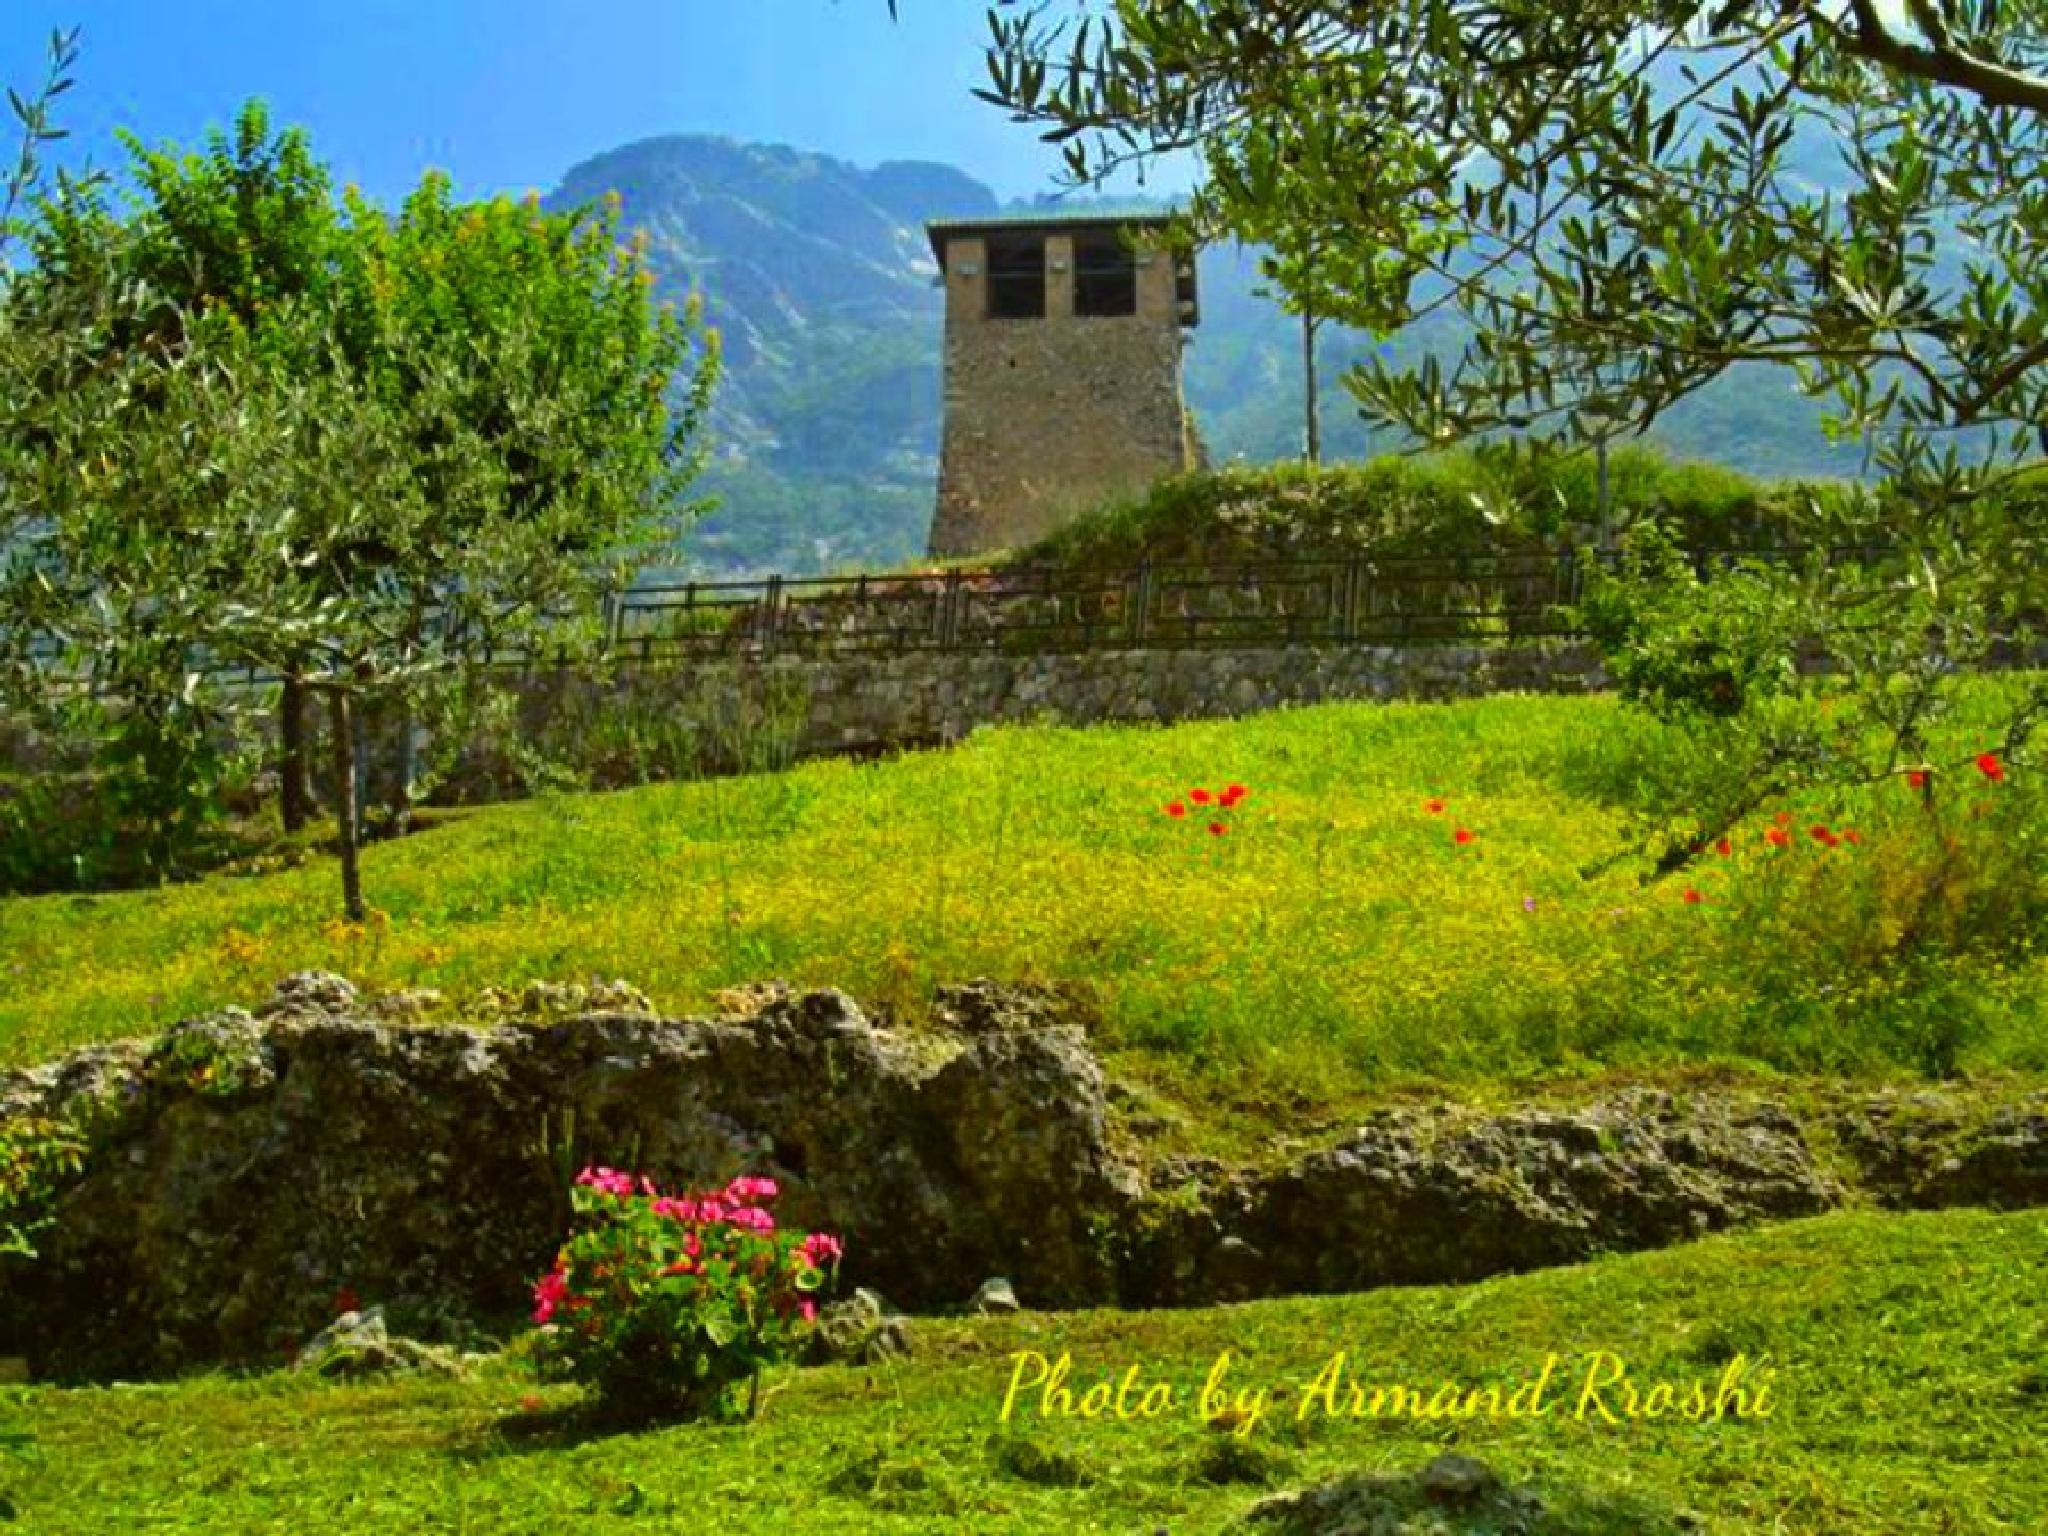 Kruje, Albania by Armand Rroshi